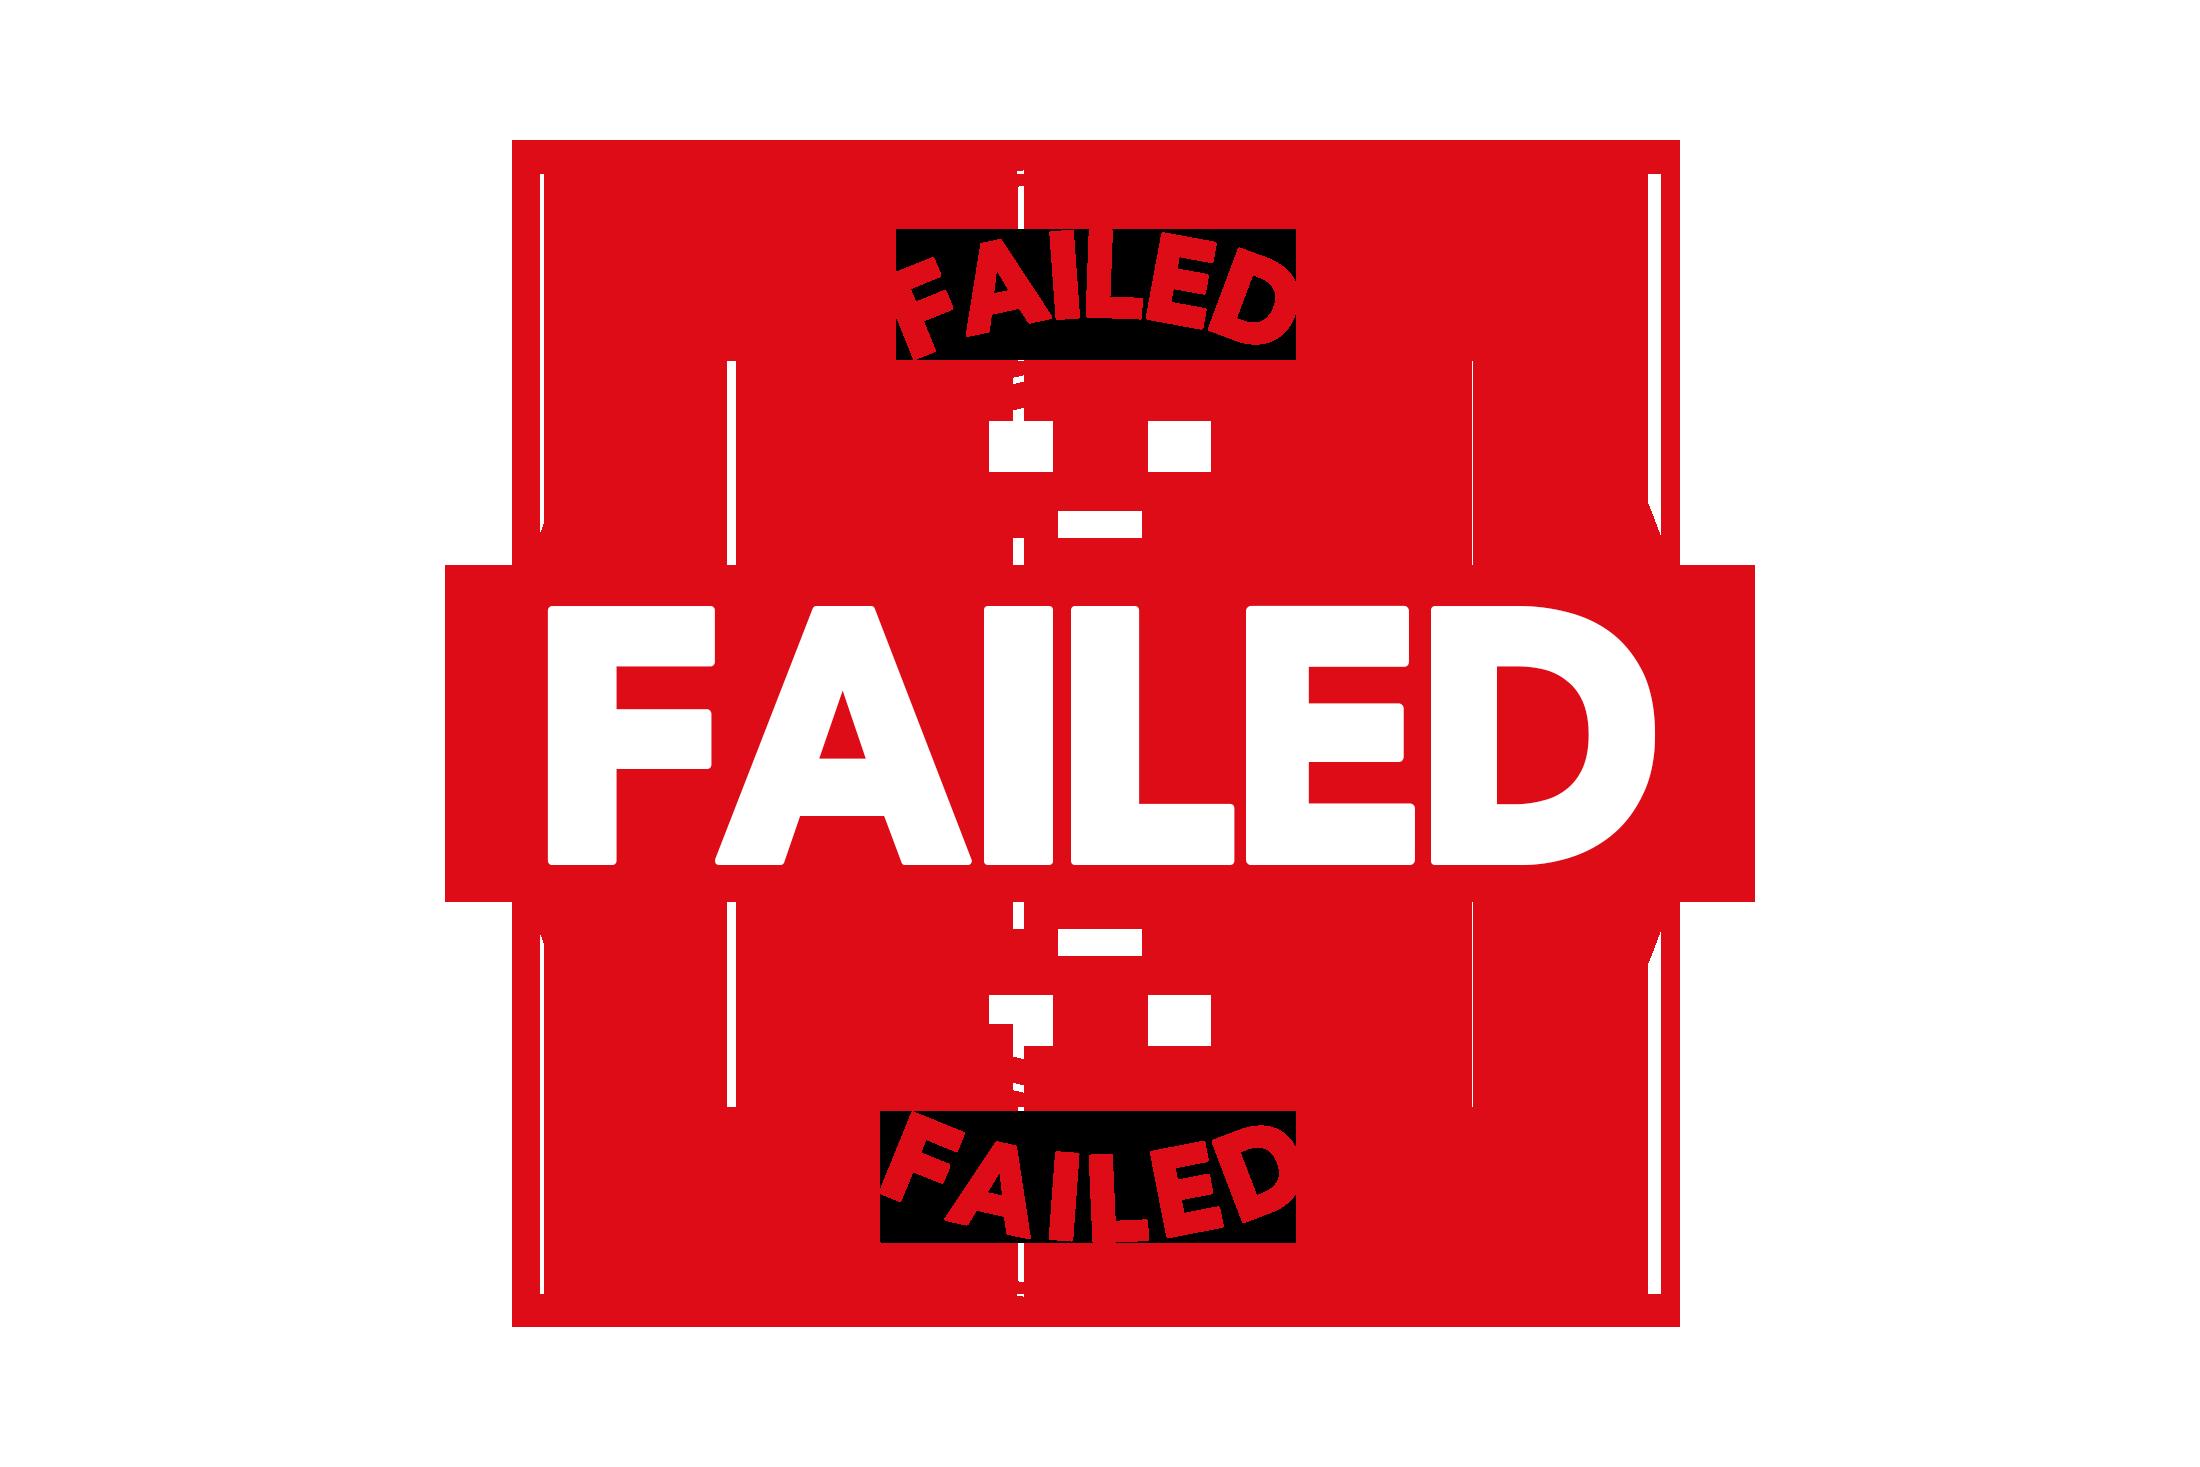 Round failed stamp PSD